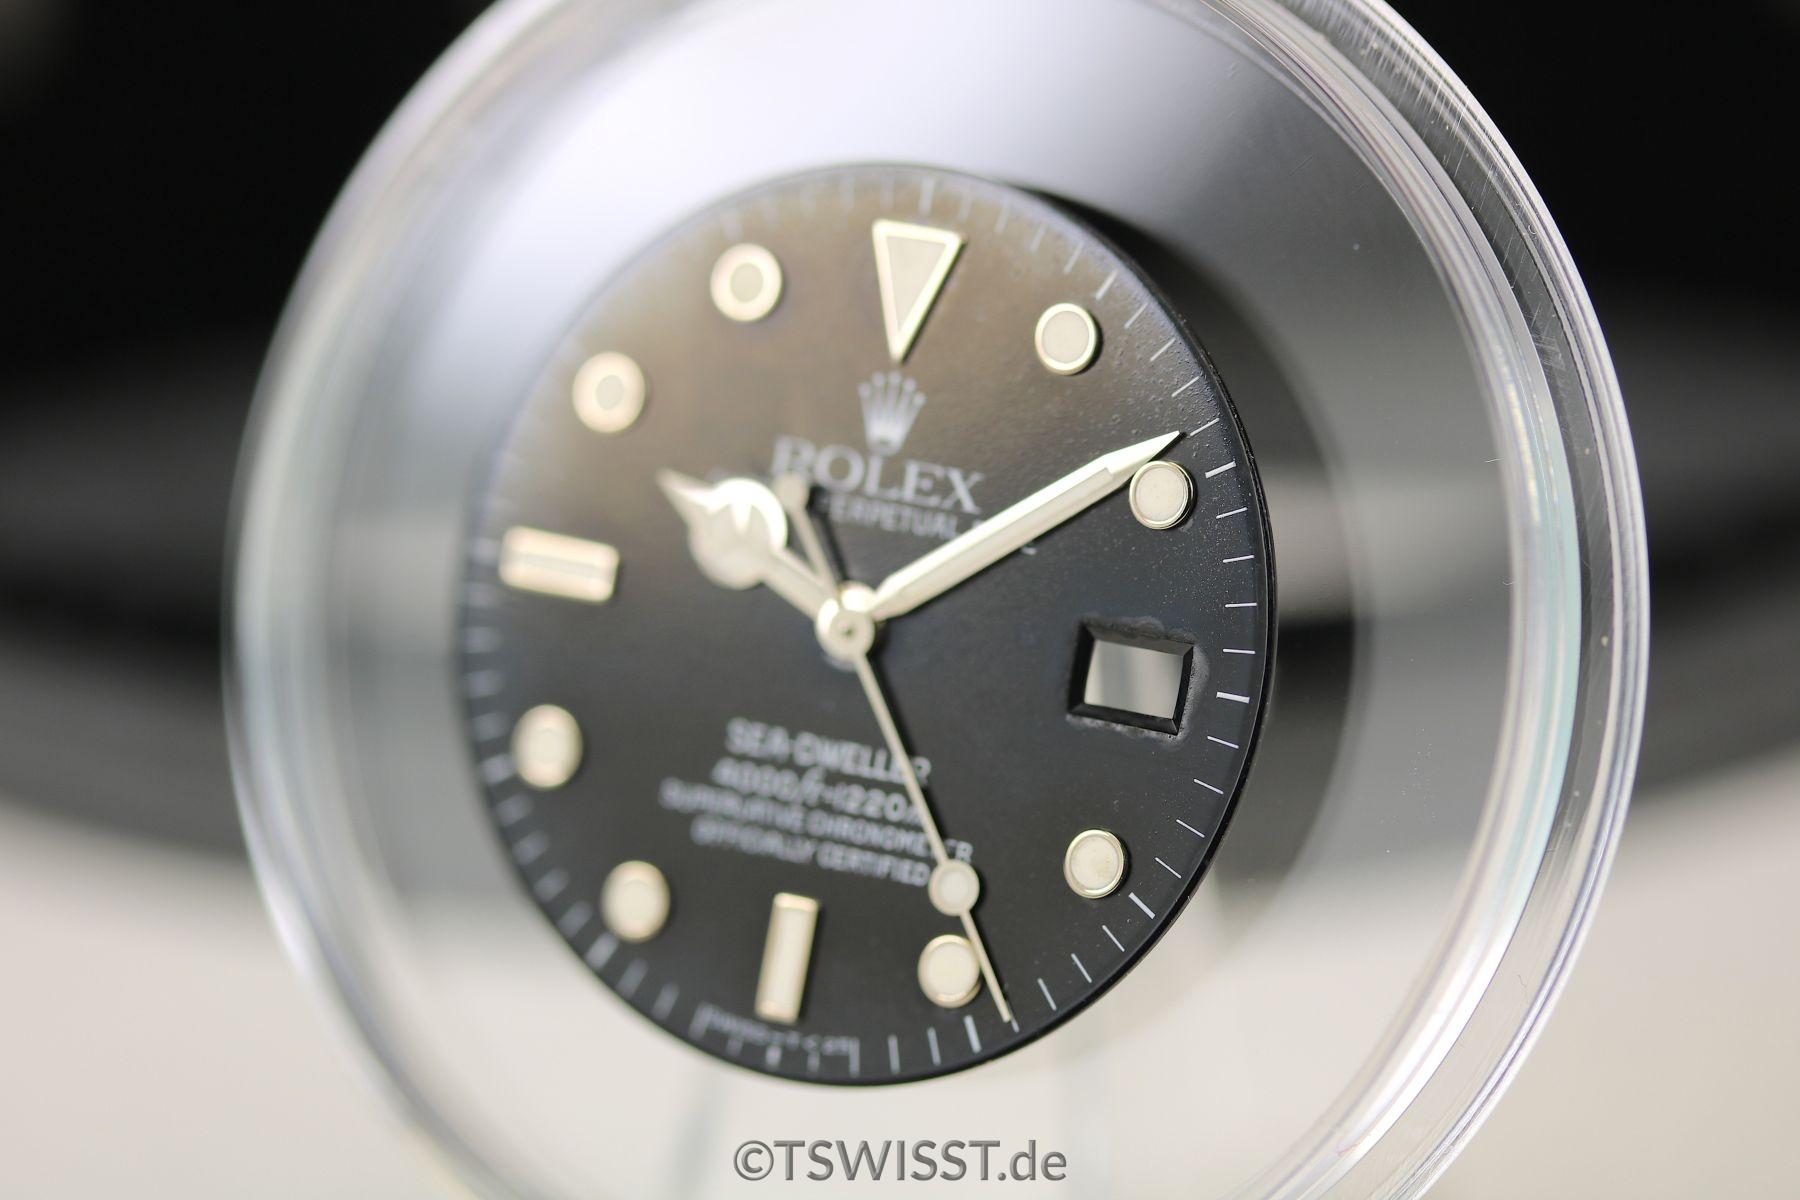 Rolex Seadweller dial&hands